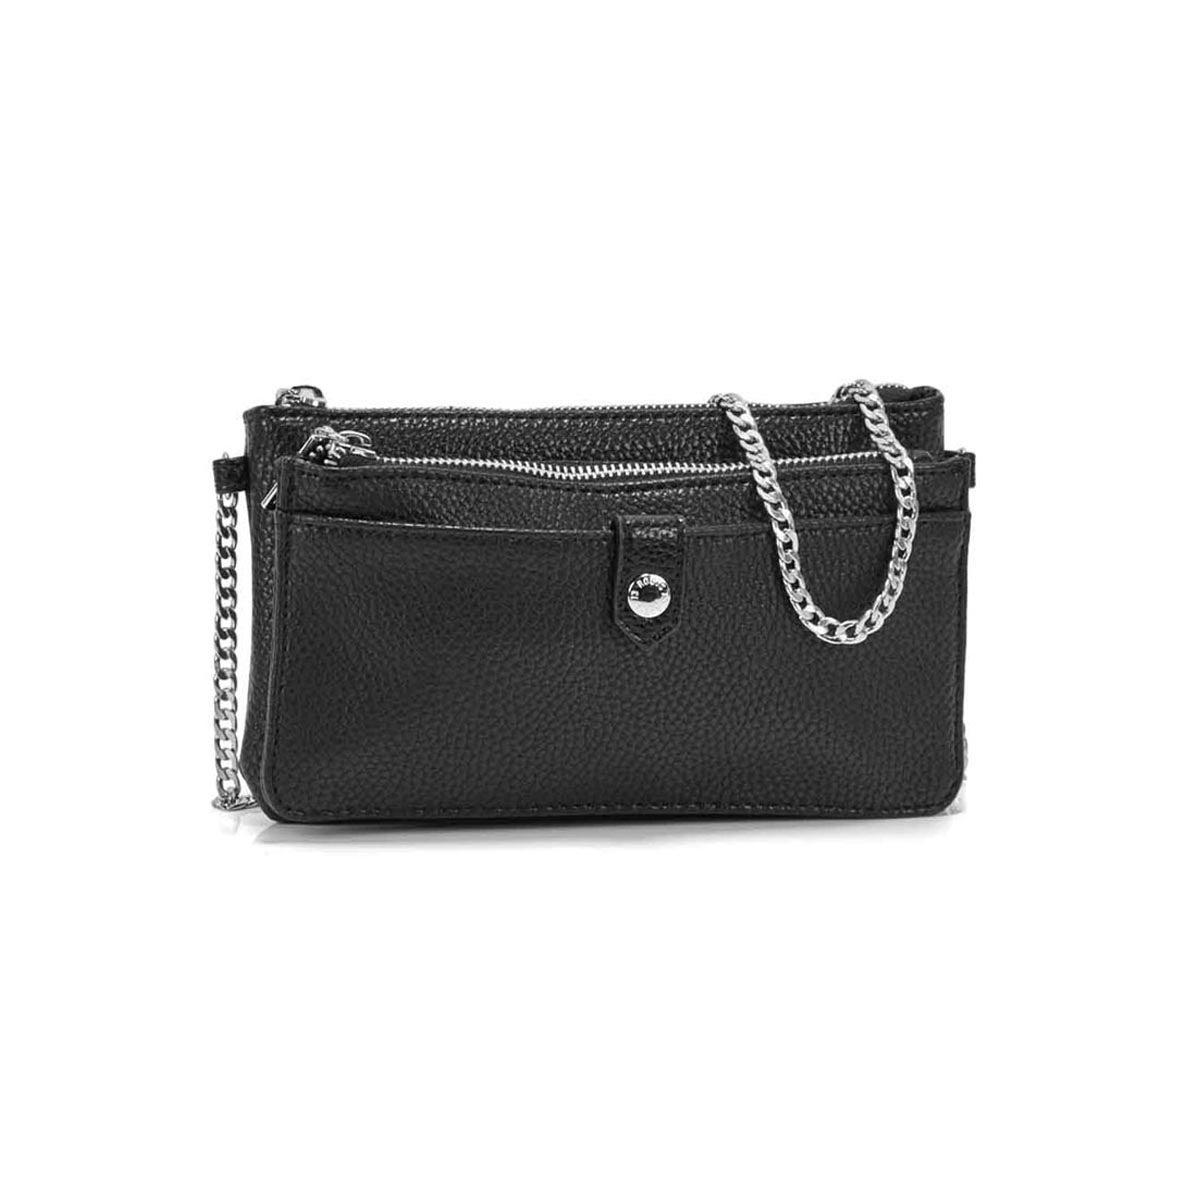 Women's R5464 black mini shoulder bag